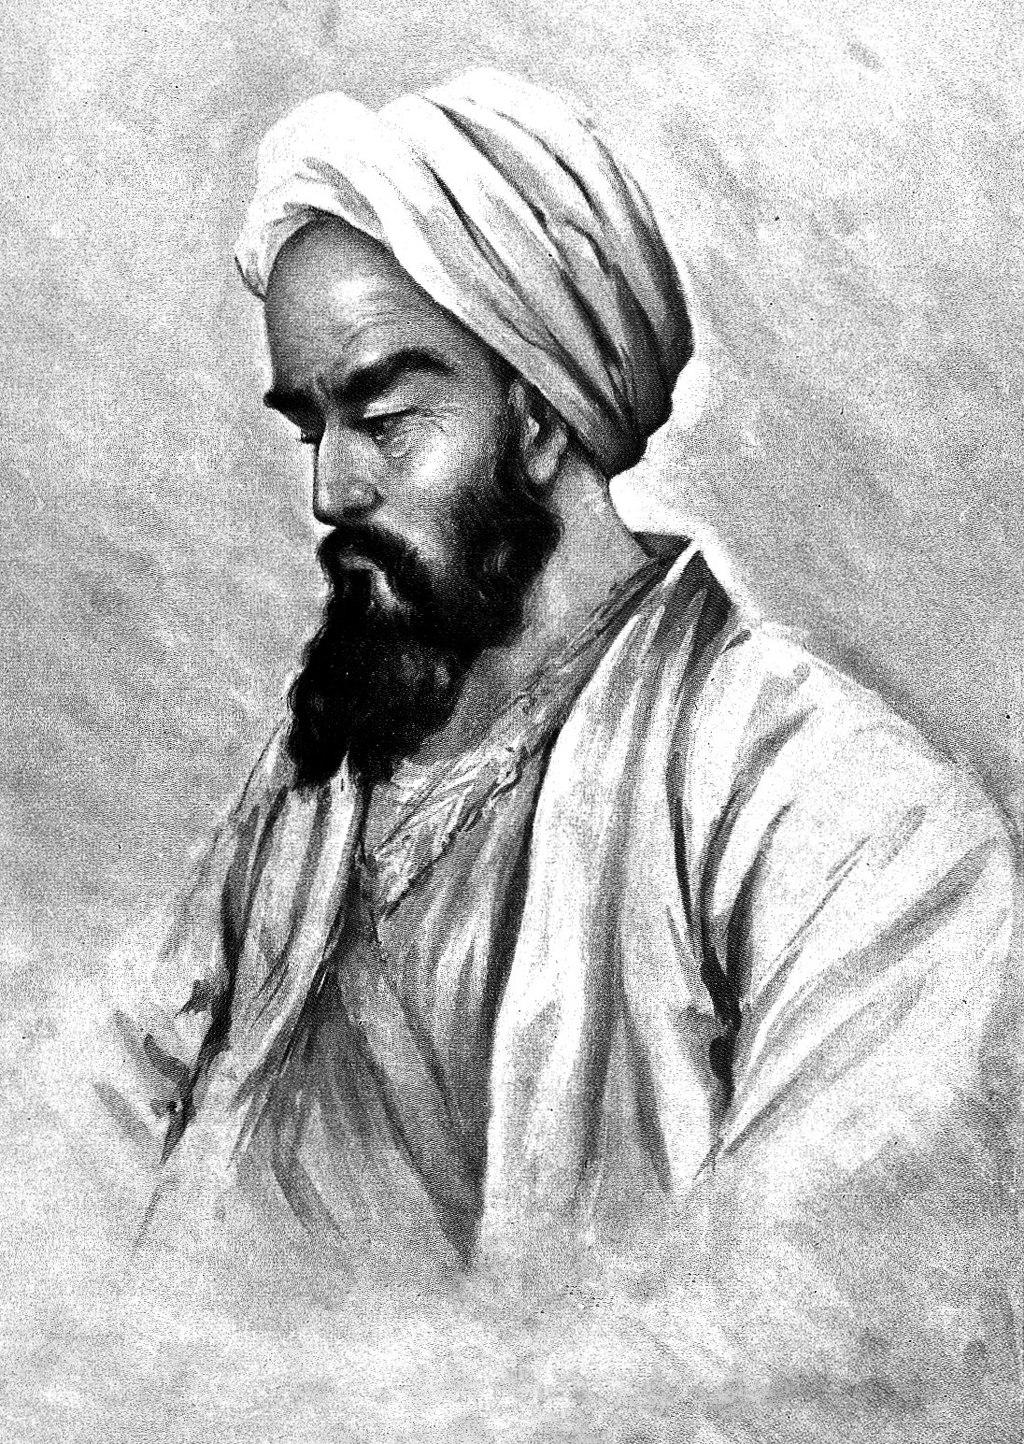 1024px-Portrait_of_Rhazes_(al-Razi)_(AD_865_-_925)_Wellcome_L0005053_(cropped)